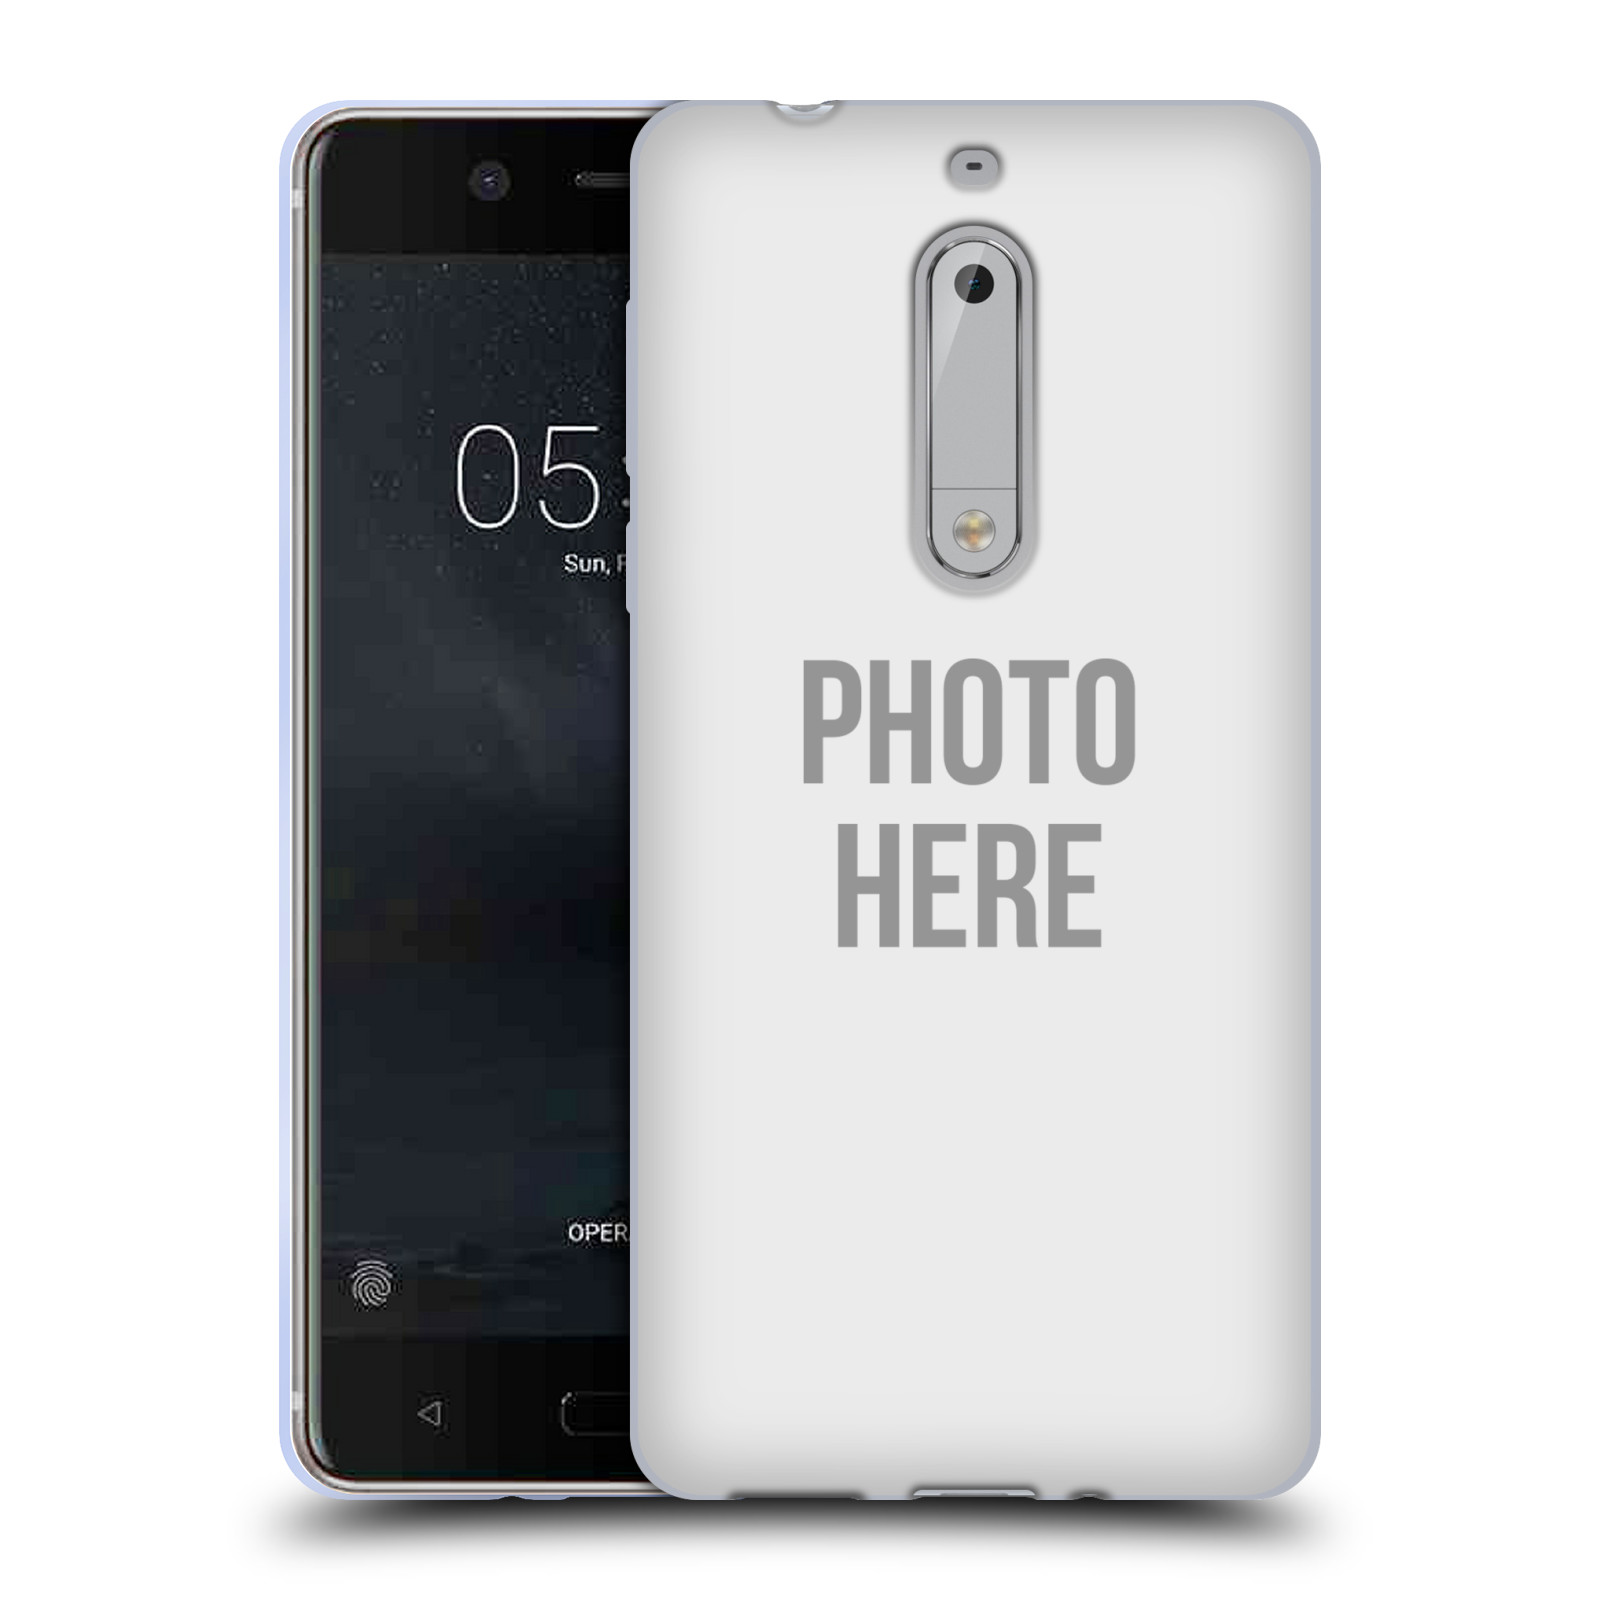 Silikonové pouzdro na mobil Nokia 5 Head Case - s vlastním motivem